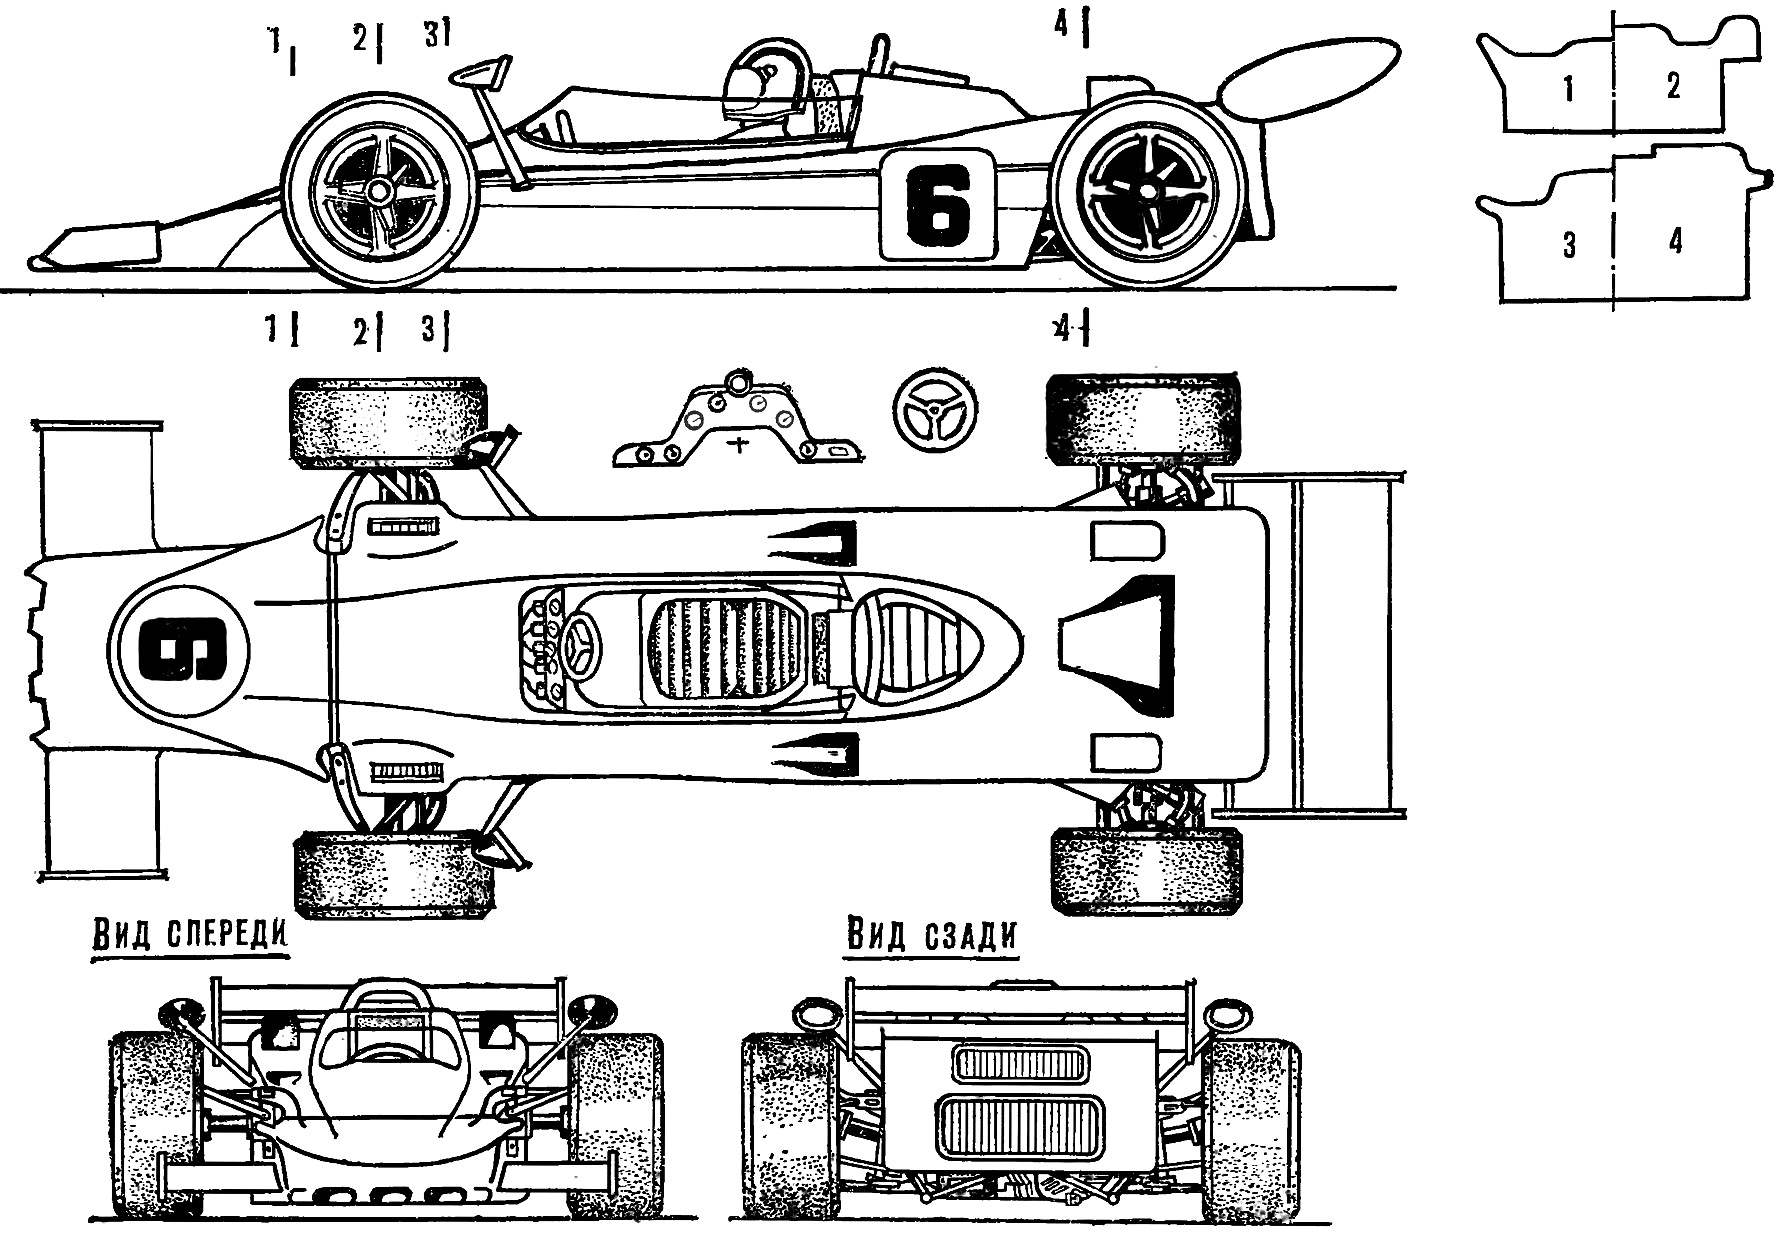 Рис. 1. Модель